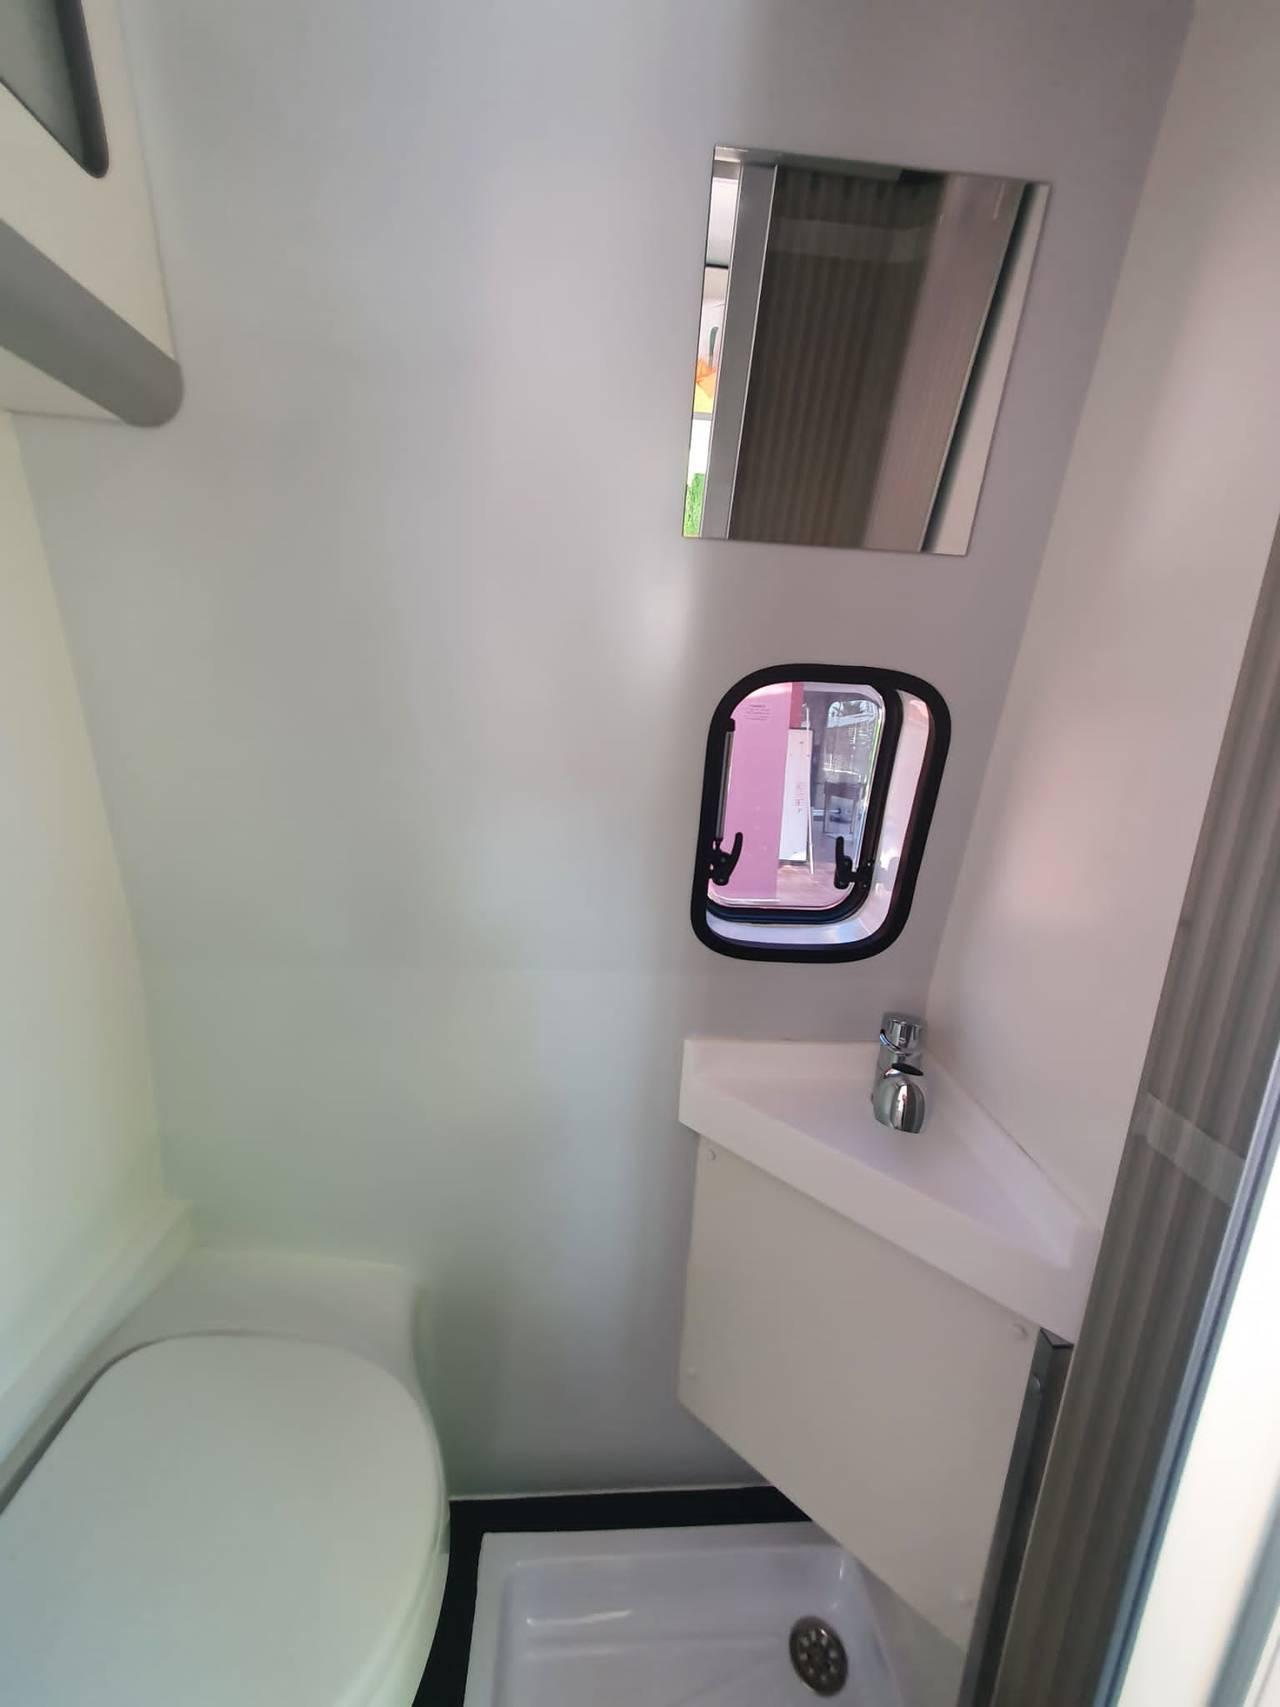 Alquiler furgoneta Camper en Alicante Mercedes  - Foto 3